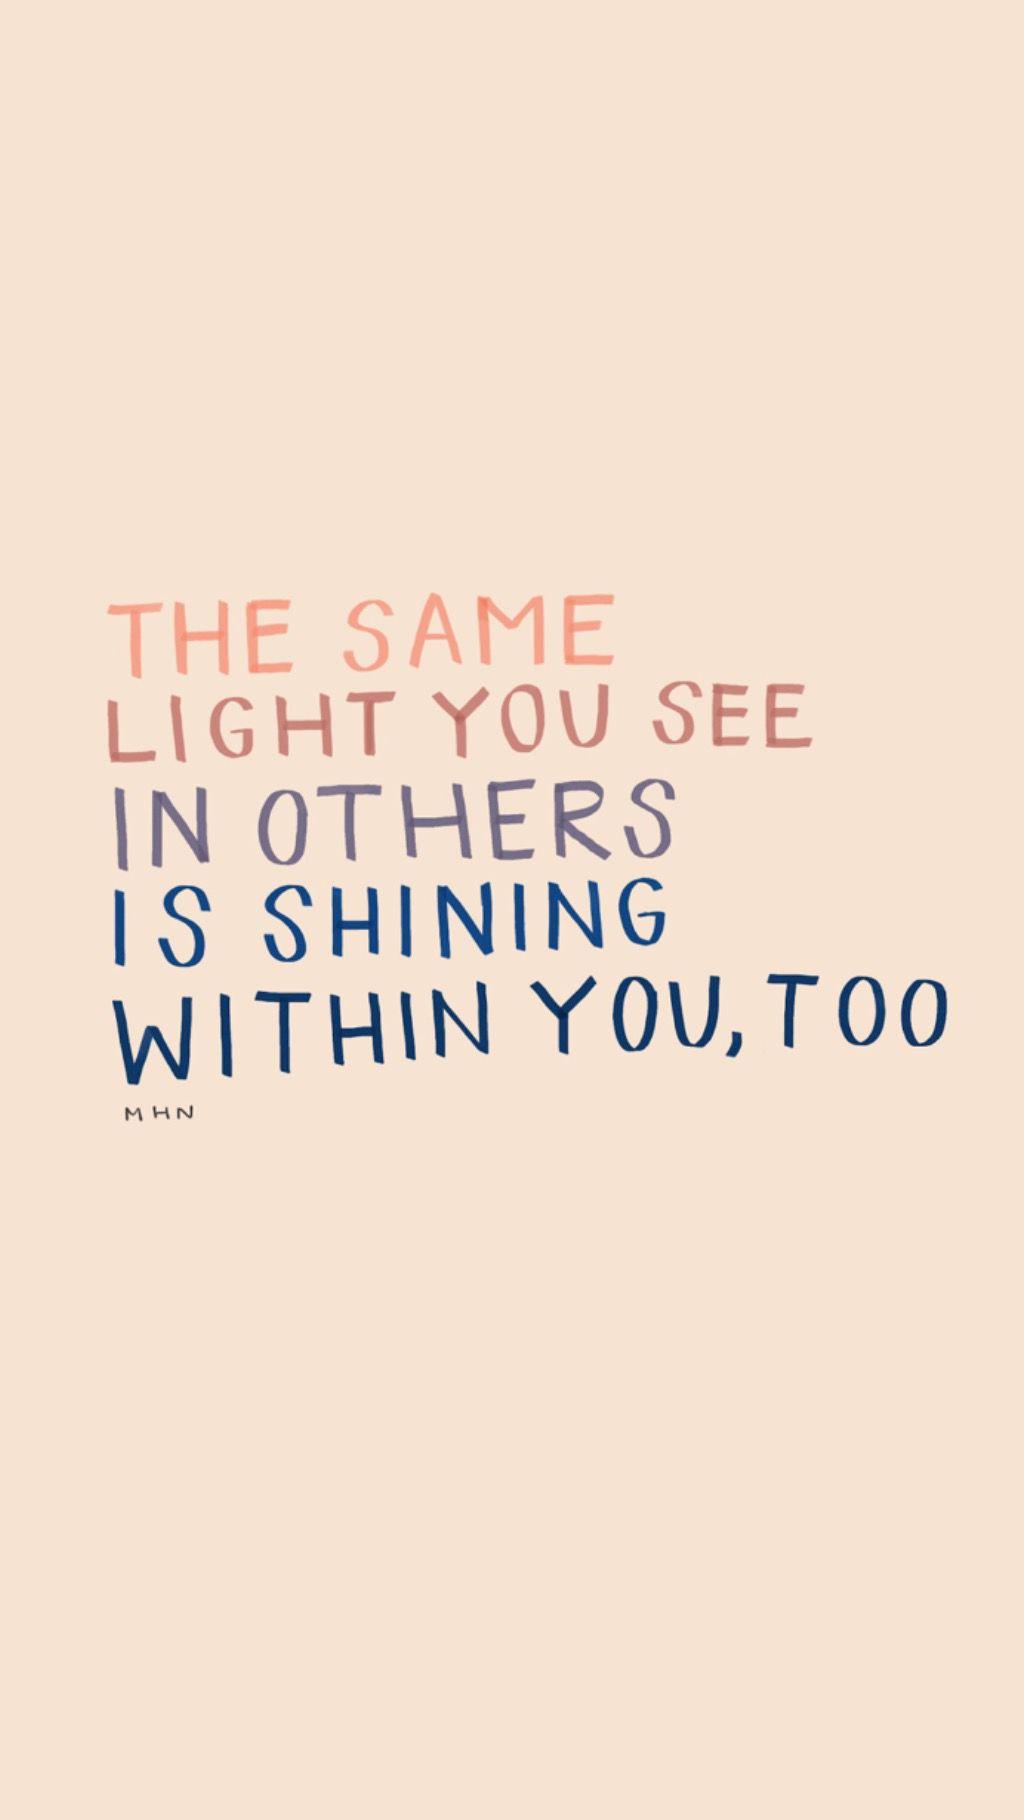 Encouraging quote, inspiring quote, Light quote, love